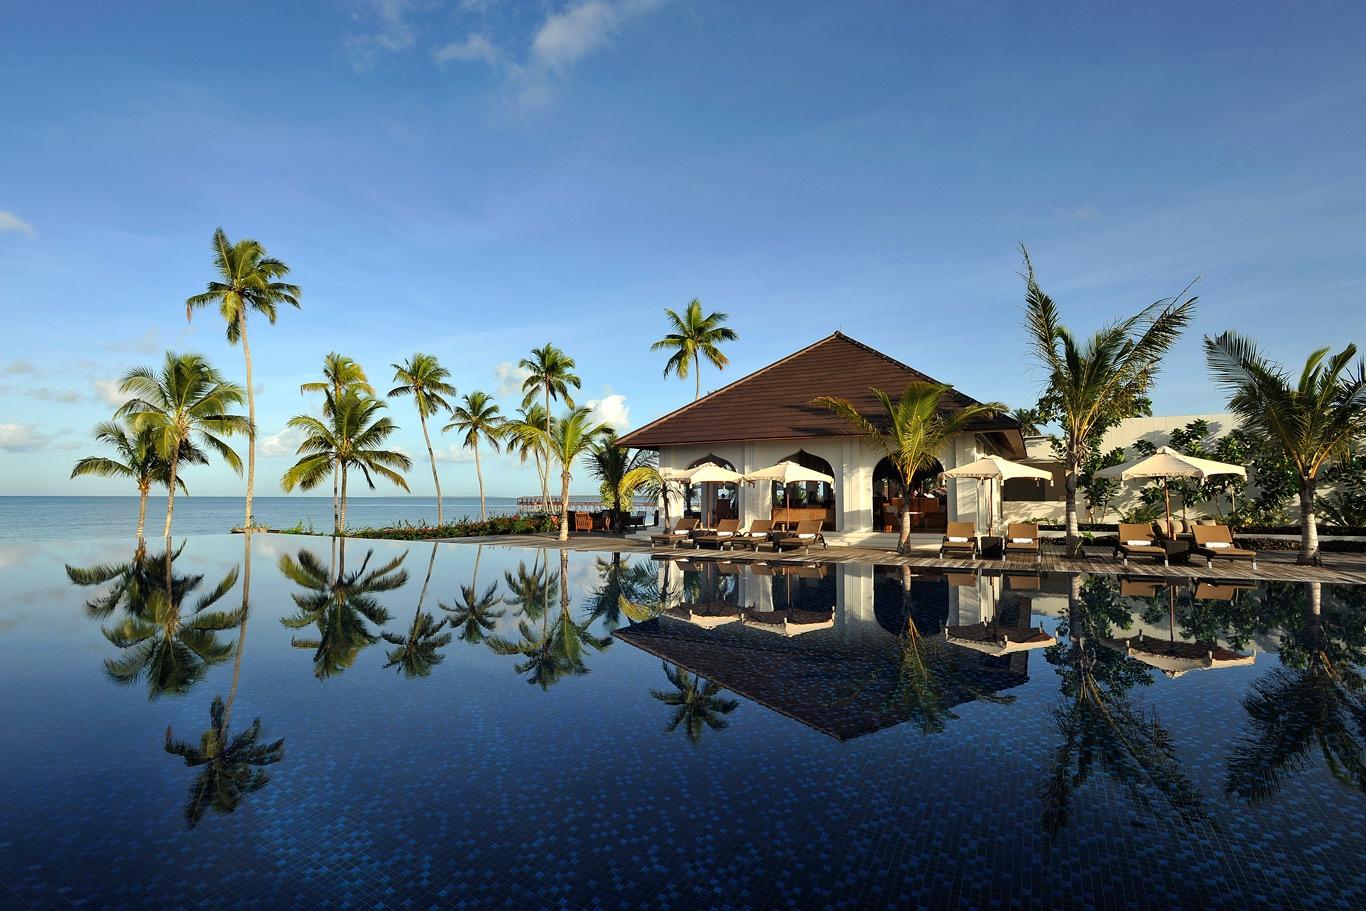 The Residence Zanzibar 1366x911 c